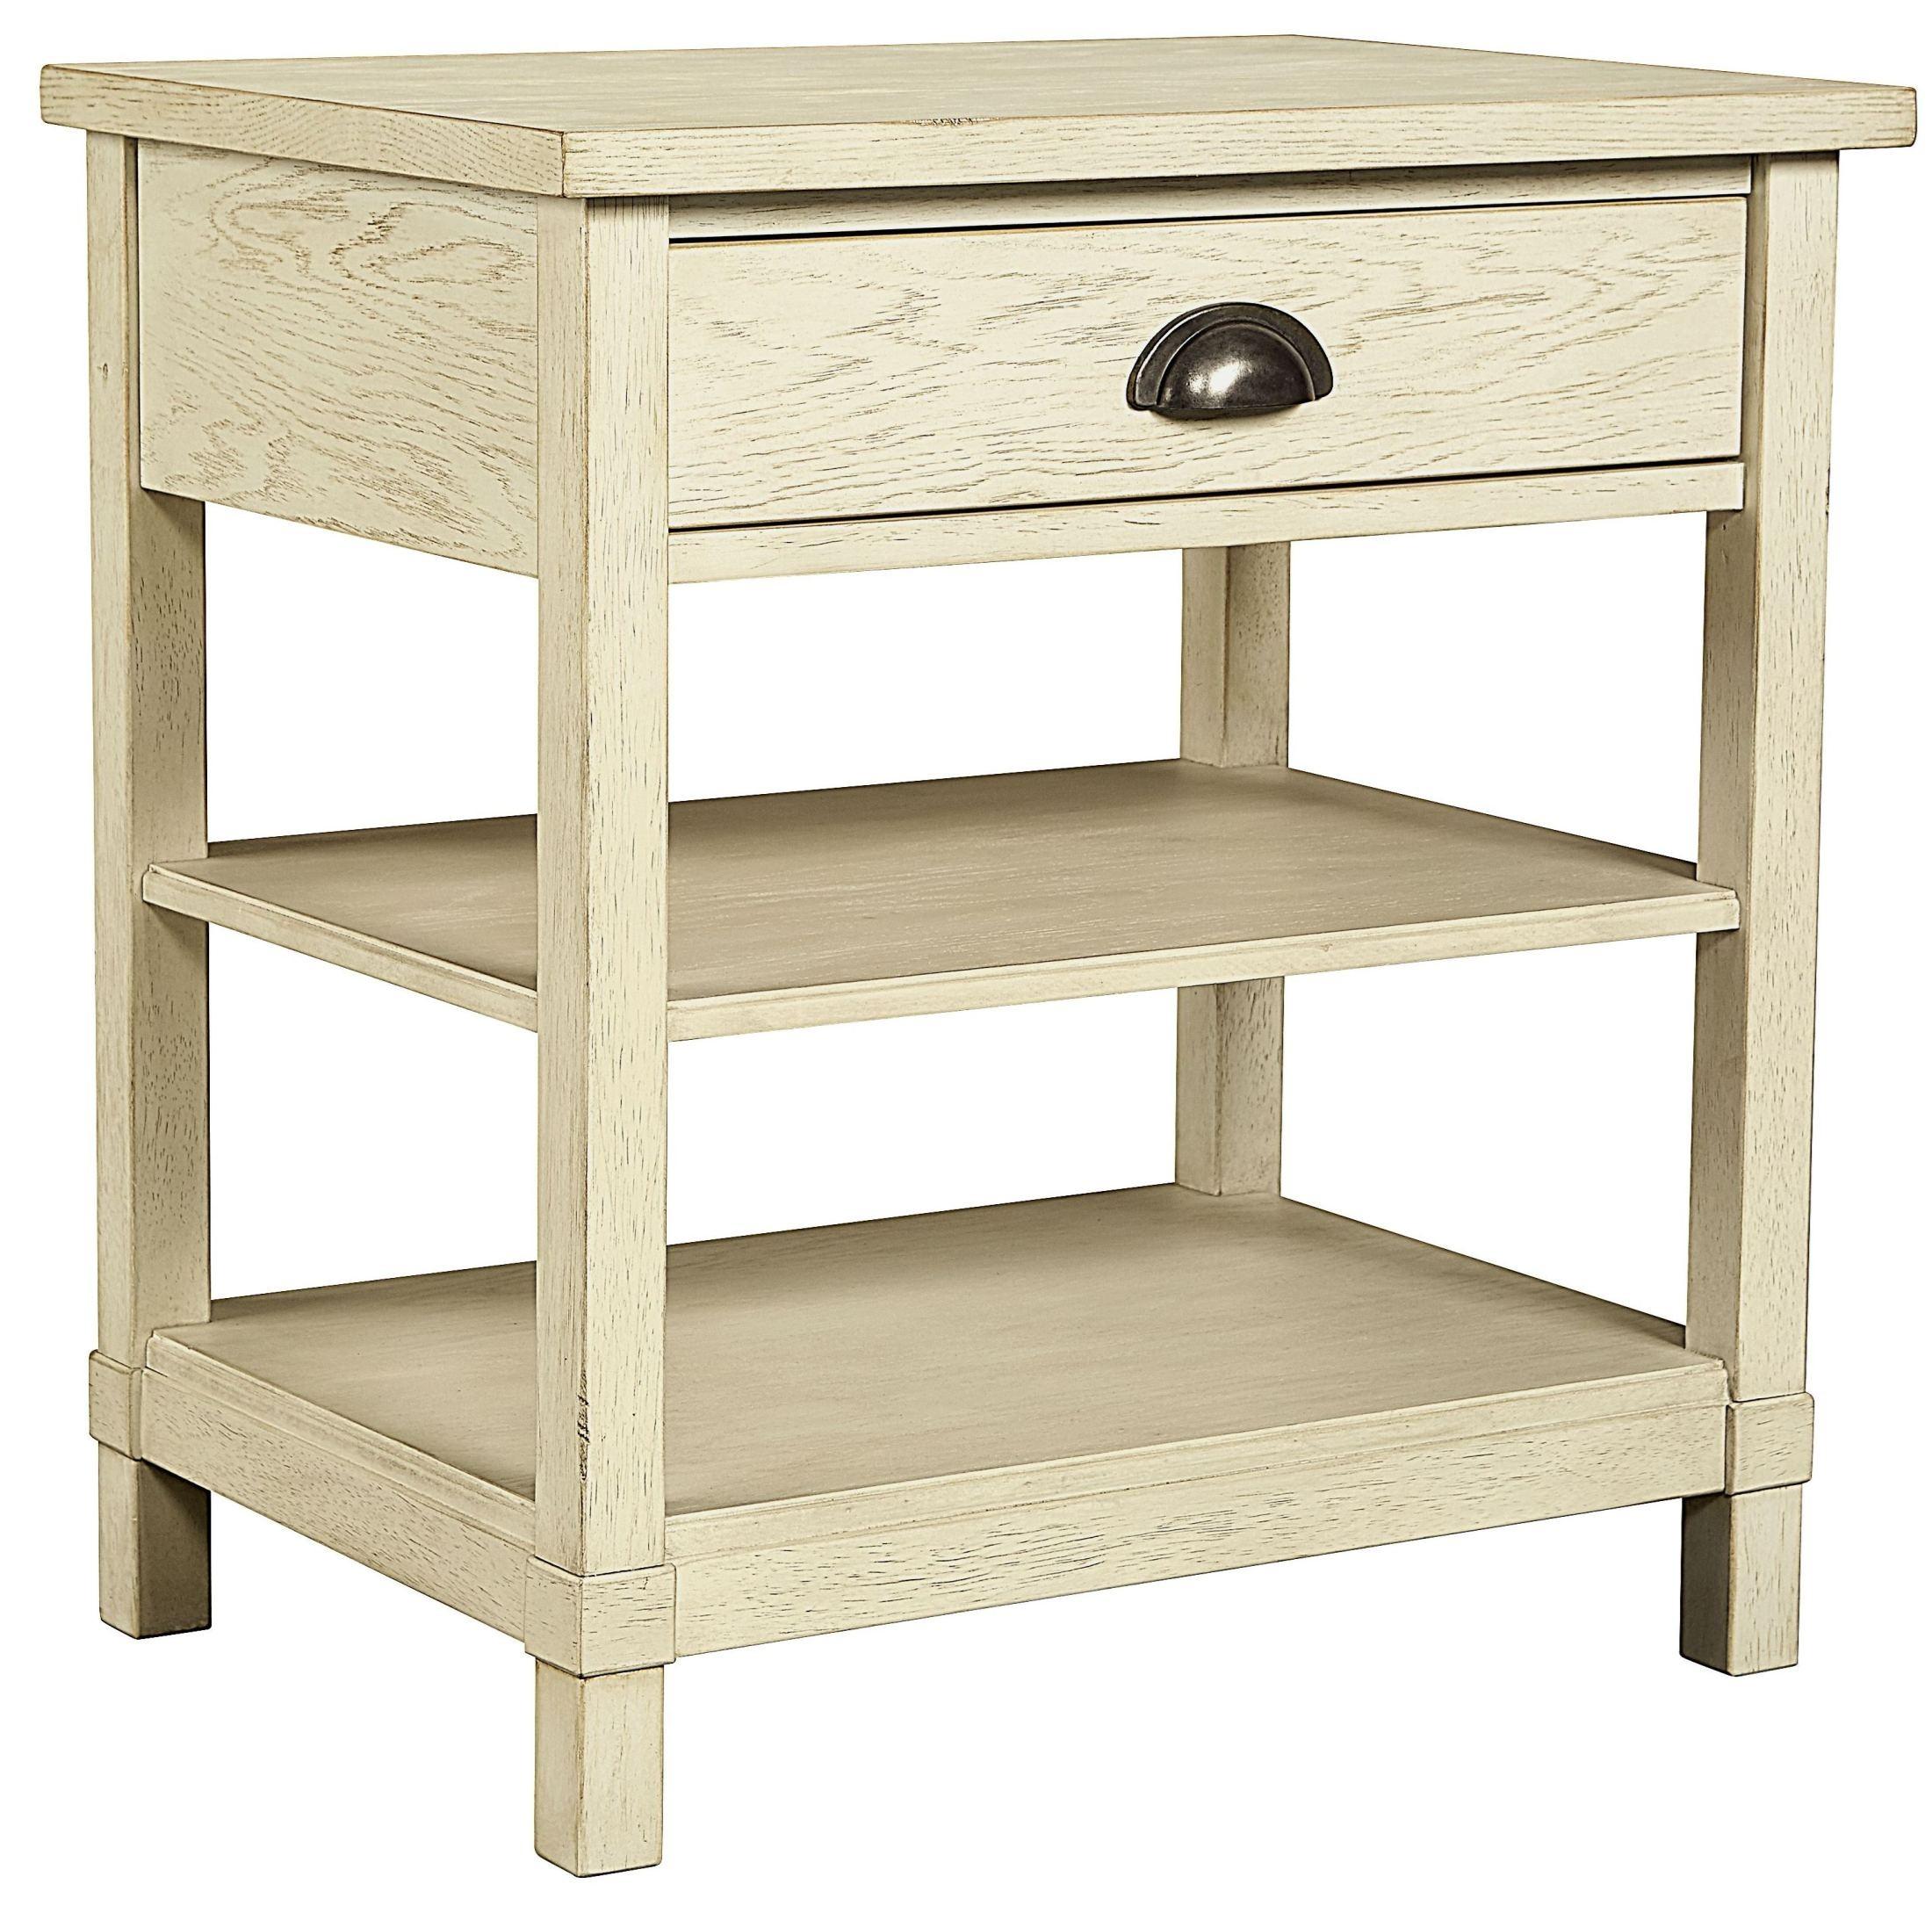 driftwood park vanilla oak panel bedroom set 536 23 45 stone and